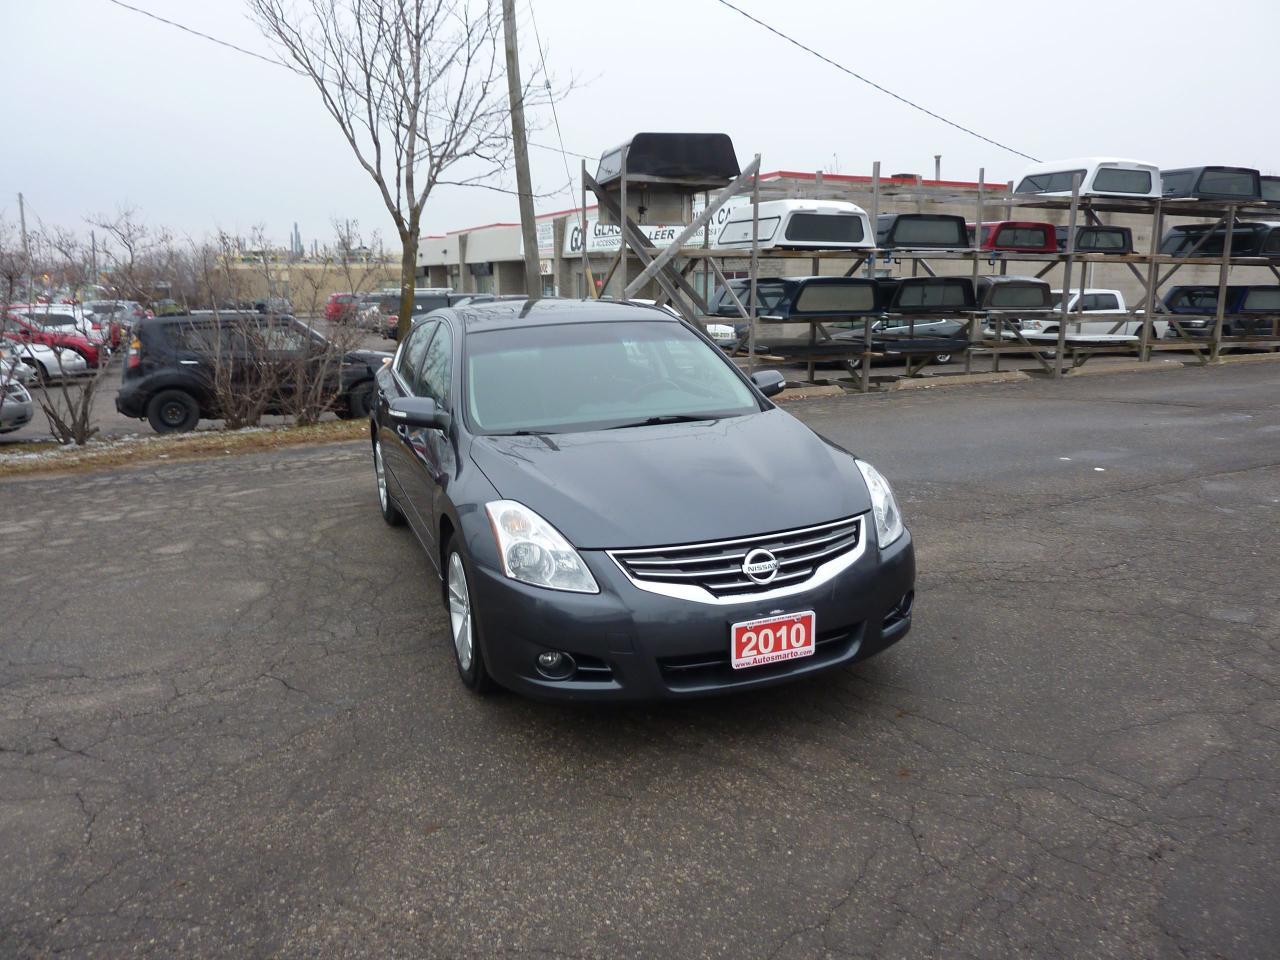 2010 Nissan Altima 3.5 SR,Low Mileage,Mint Condition